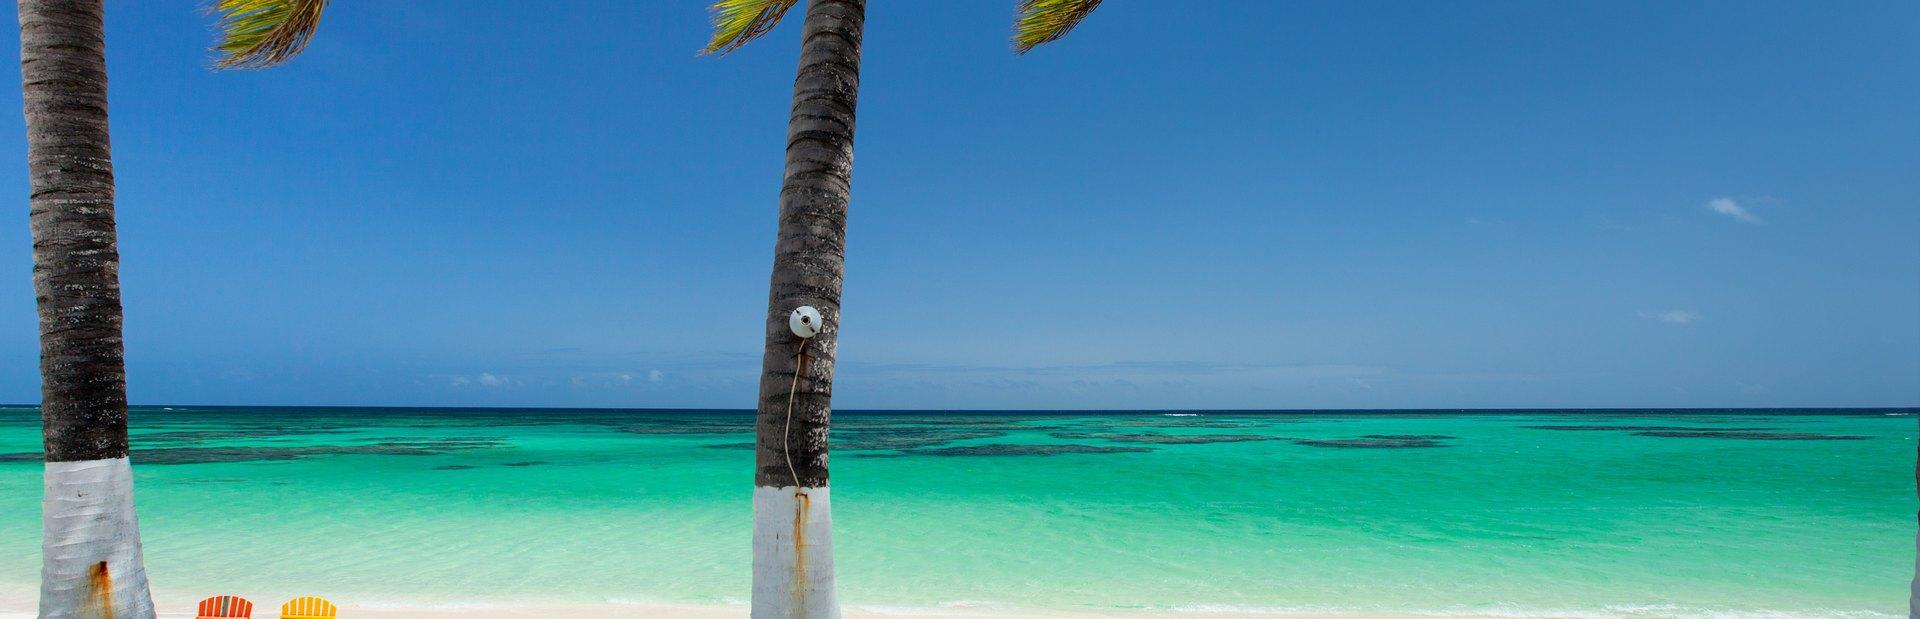 Anegada Island inspiration and tips